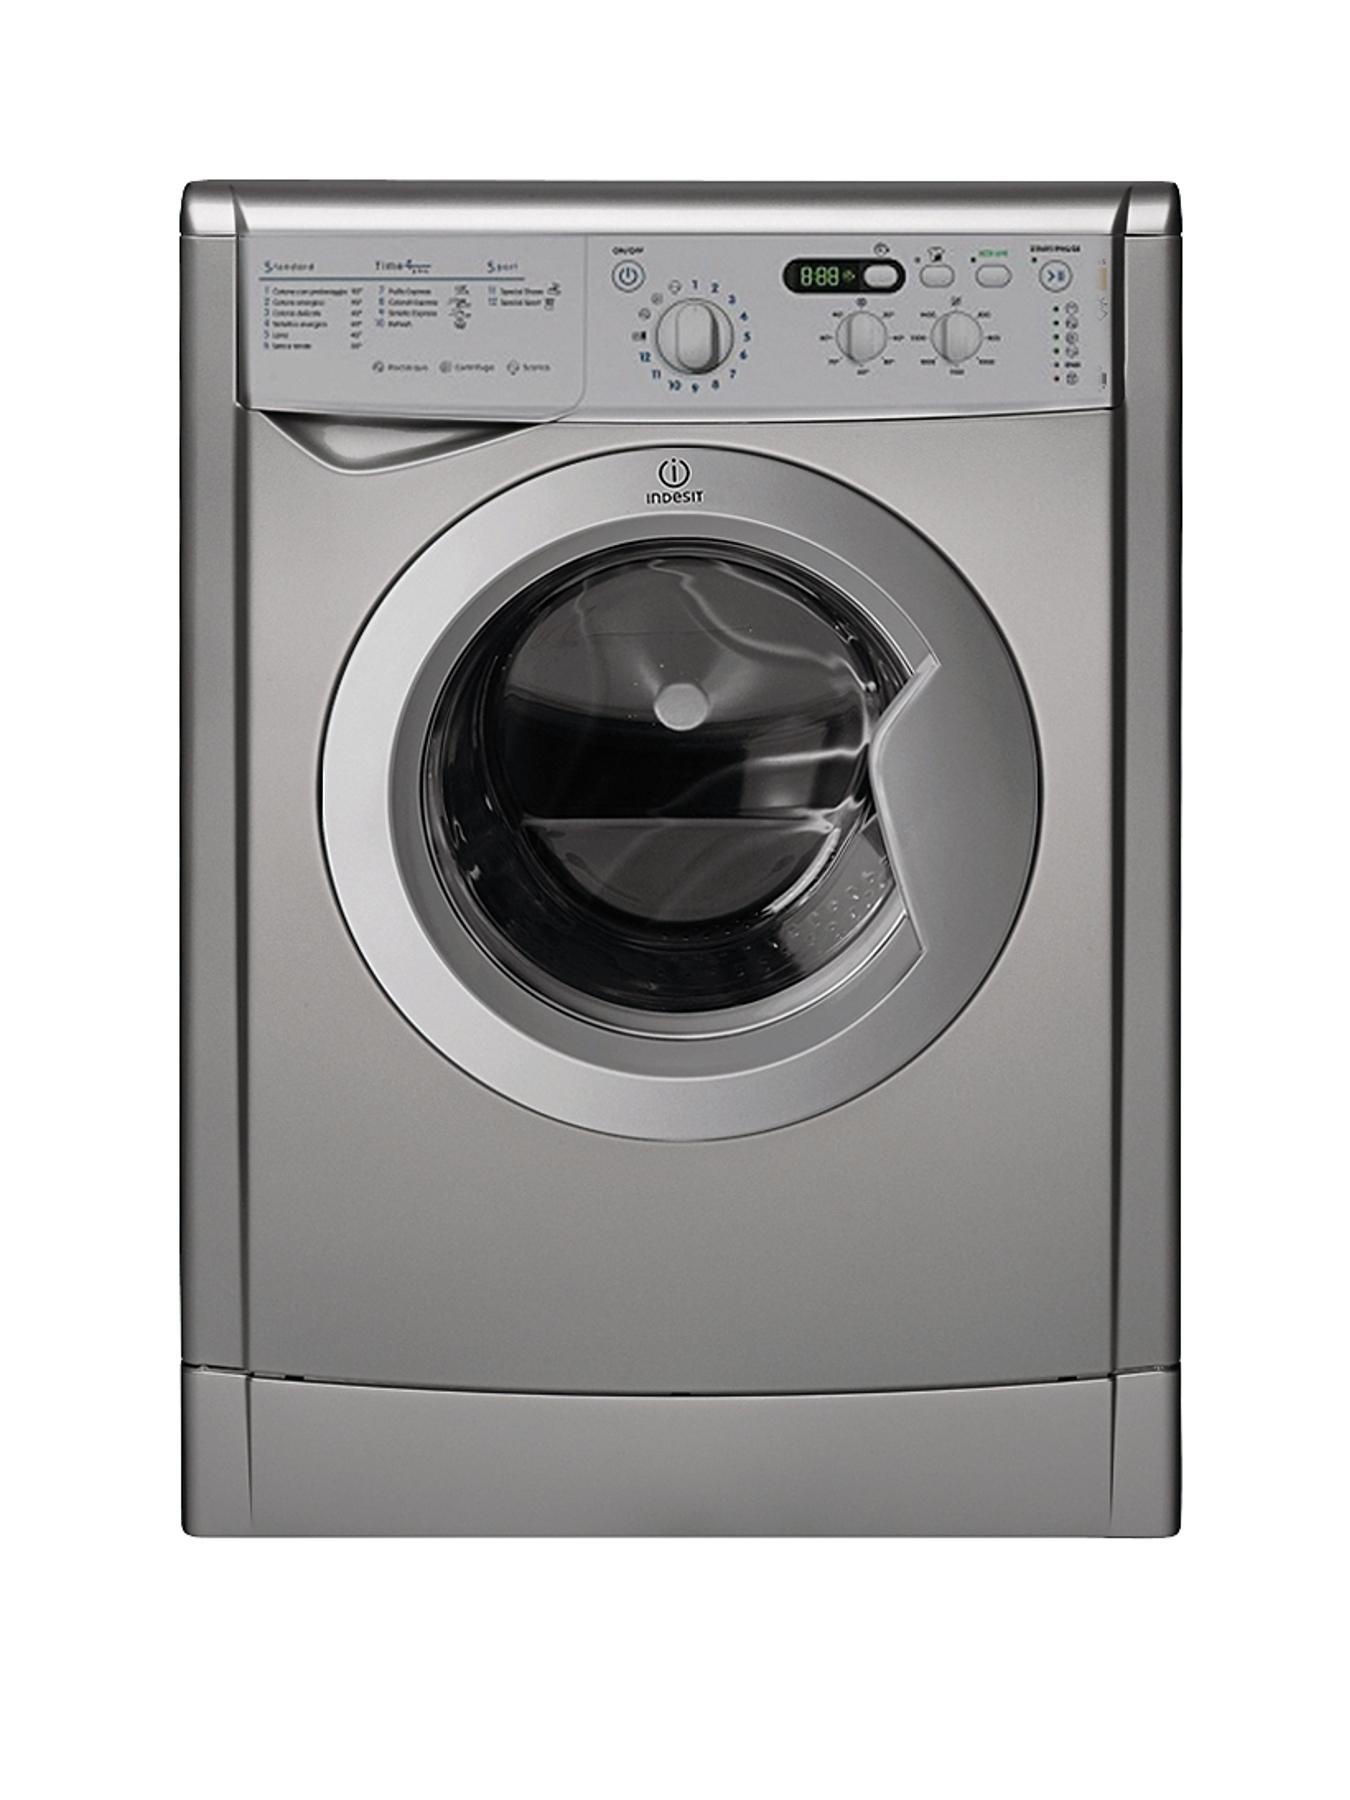 washing machine tearing clothes